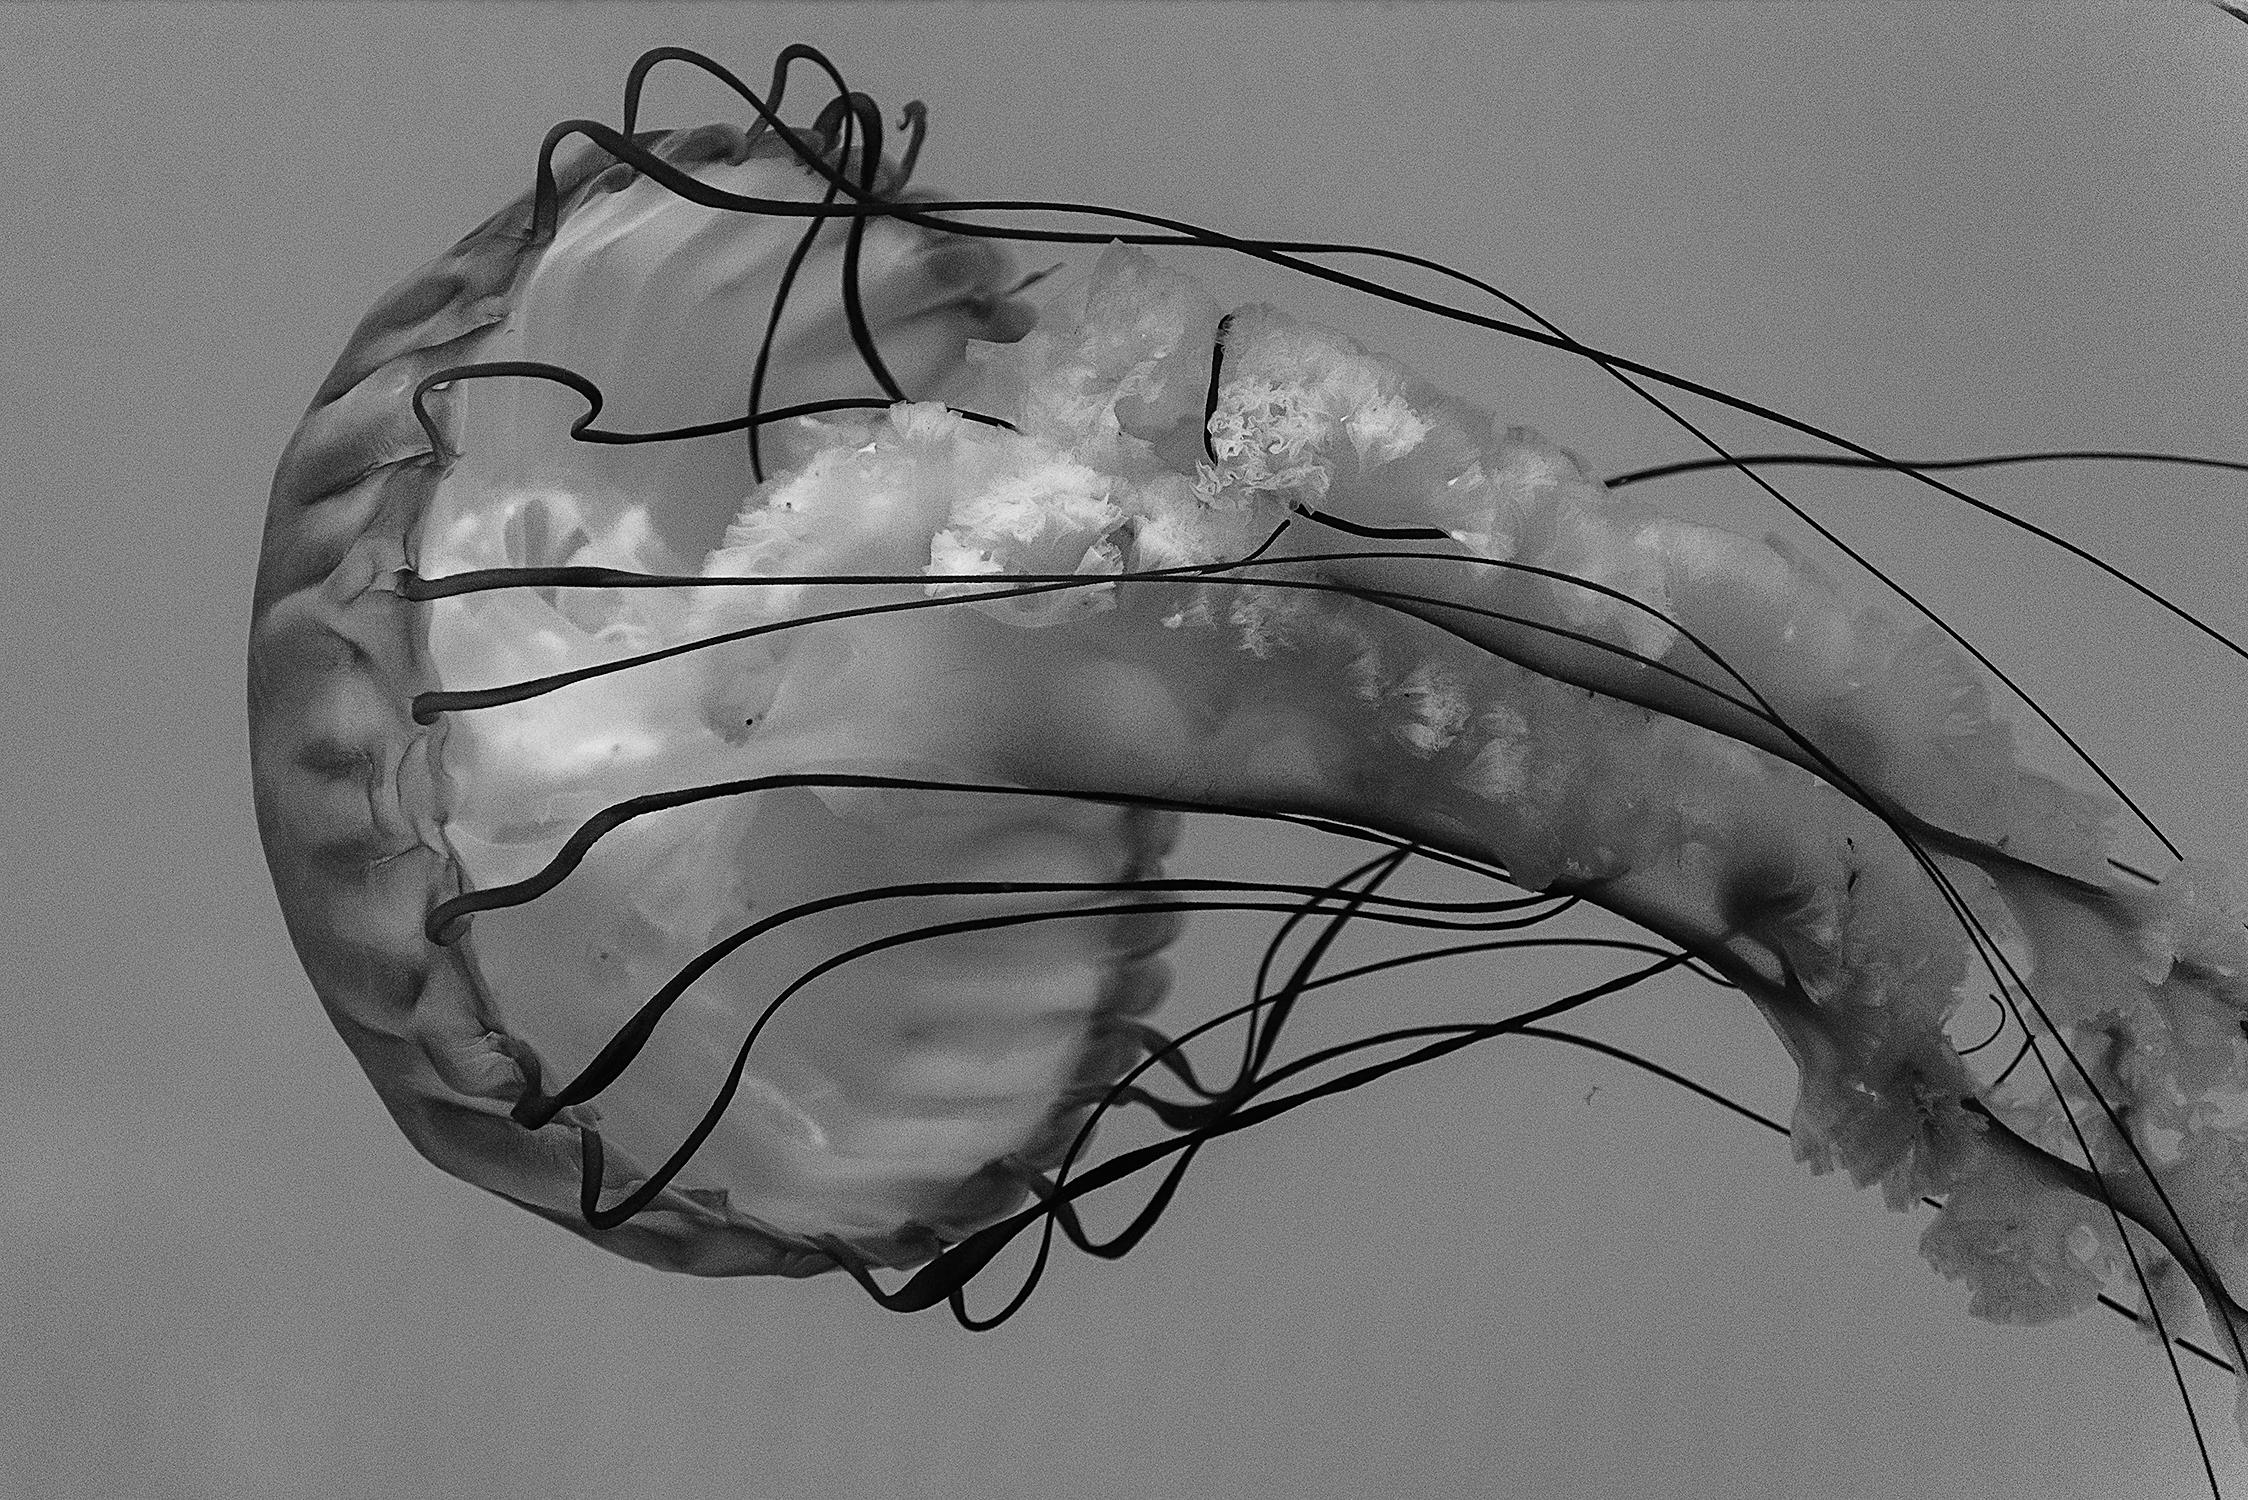 Pacific sea nettle's bell